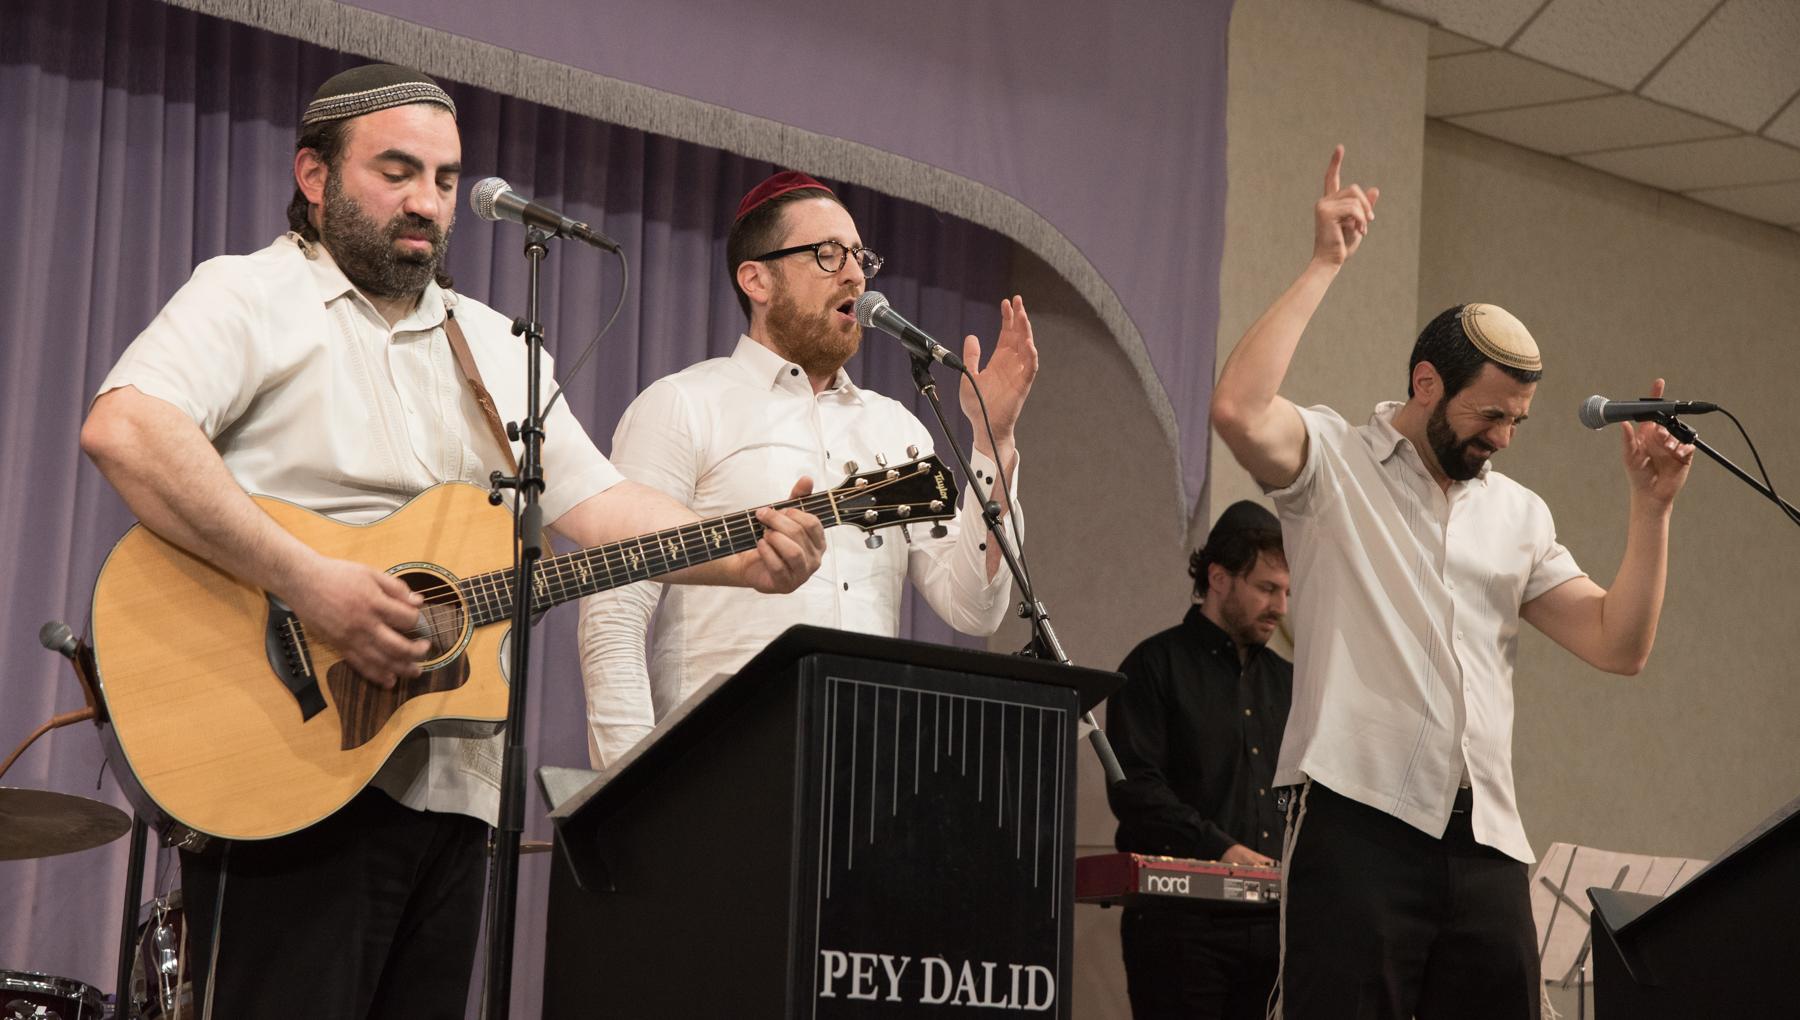 Tikvat-Israel-Pey-Dalid-Concert-040719-5487